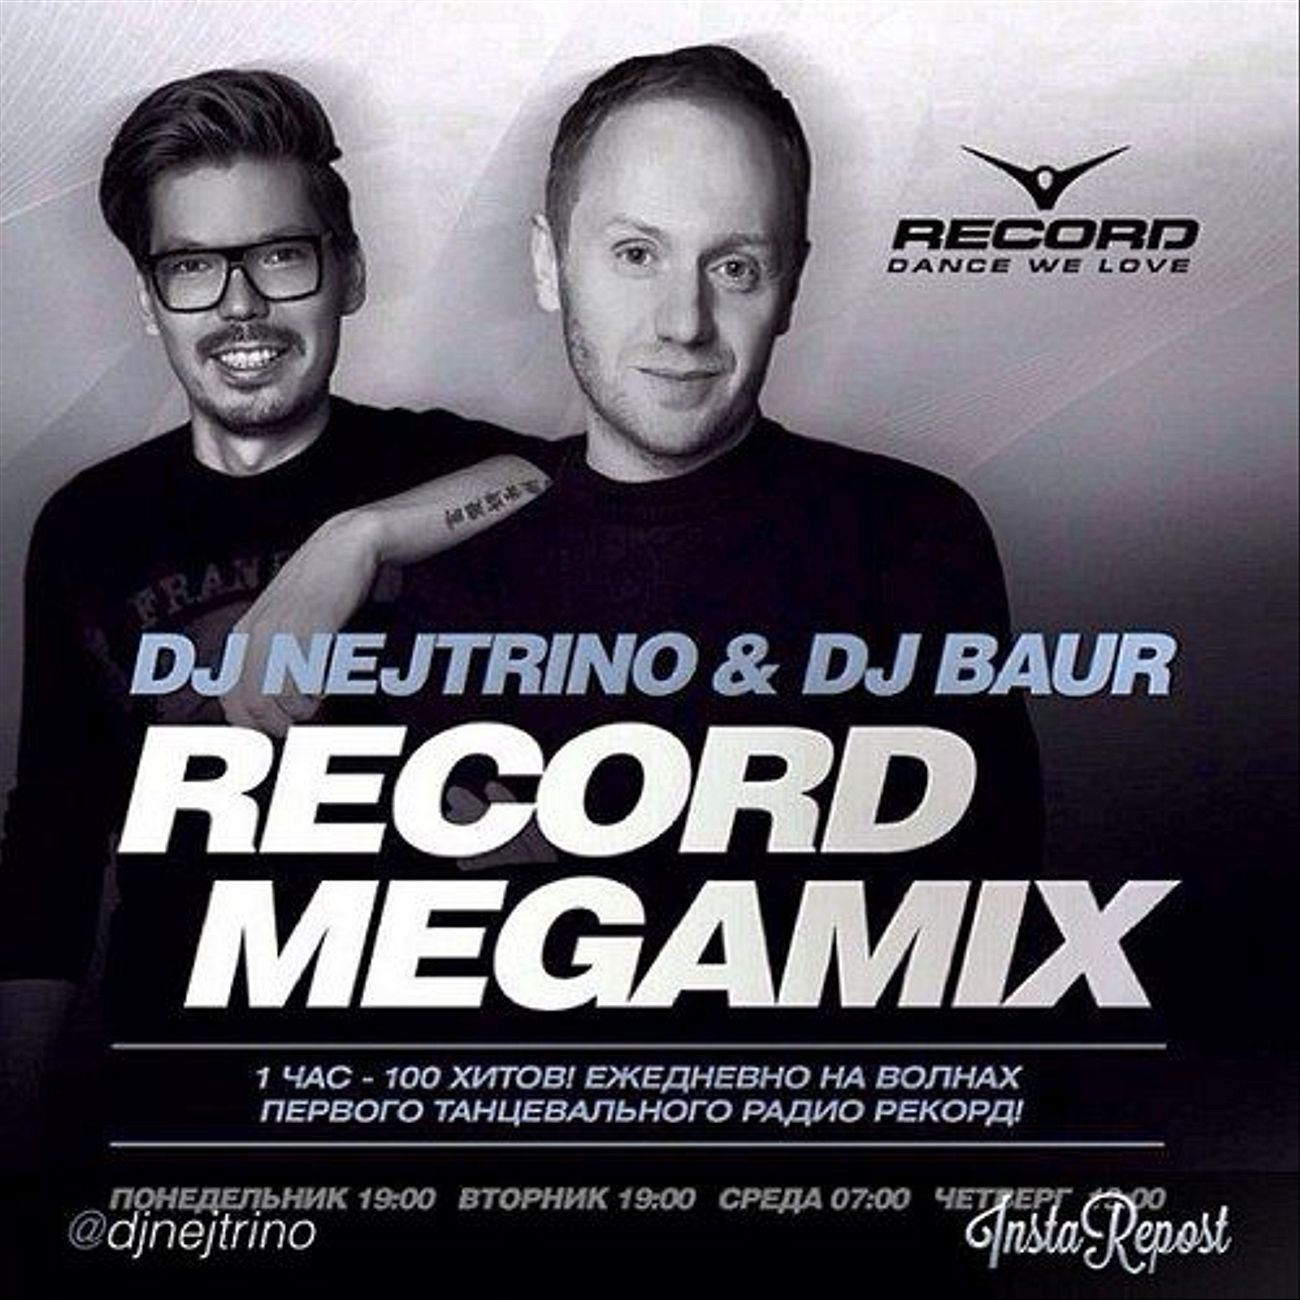 Record Megamix (DJ NEJTRINO & DJ BAUR)